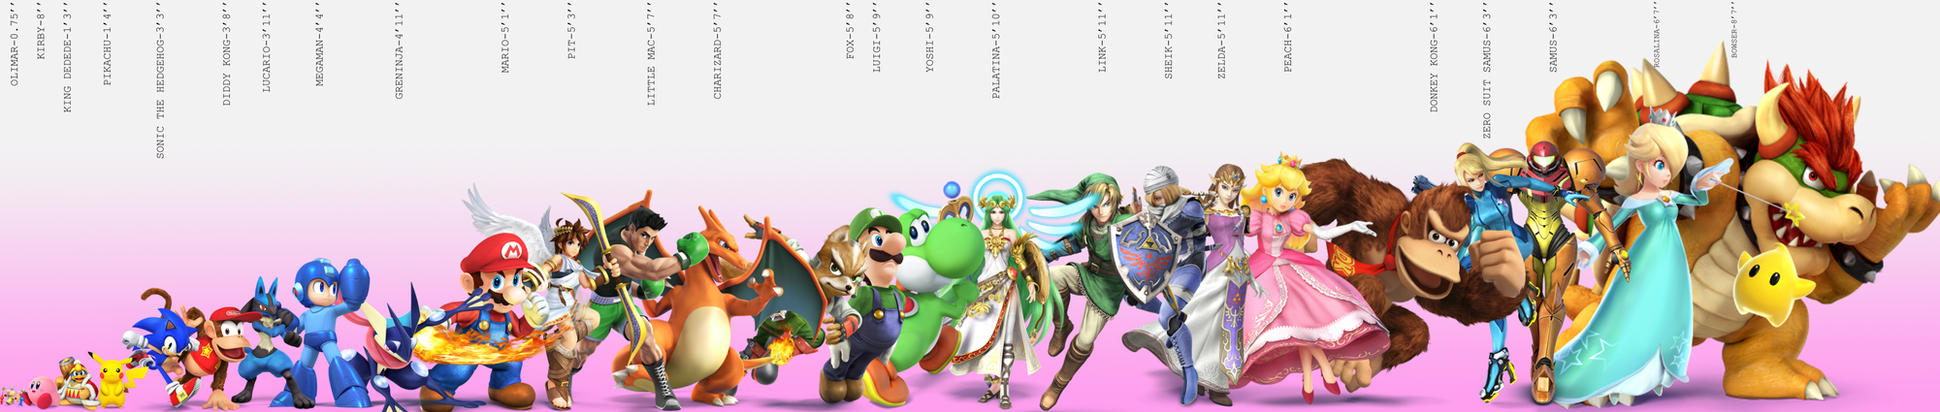 Giga Bowser Sprites Super Smash Bros. (Vid...